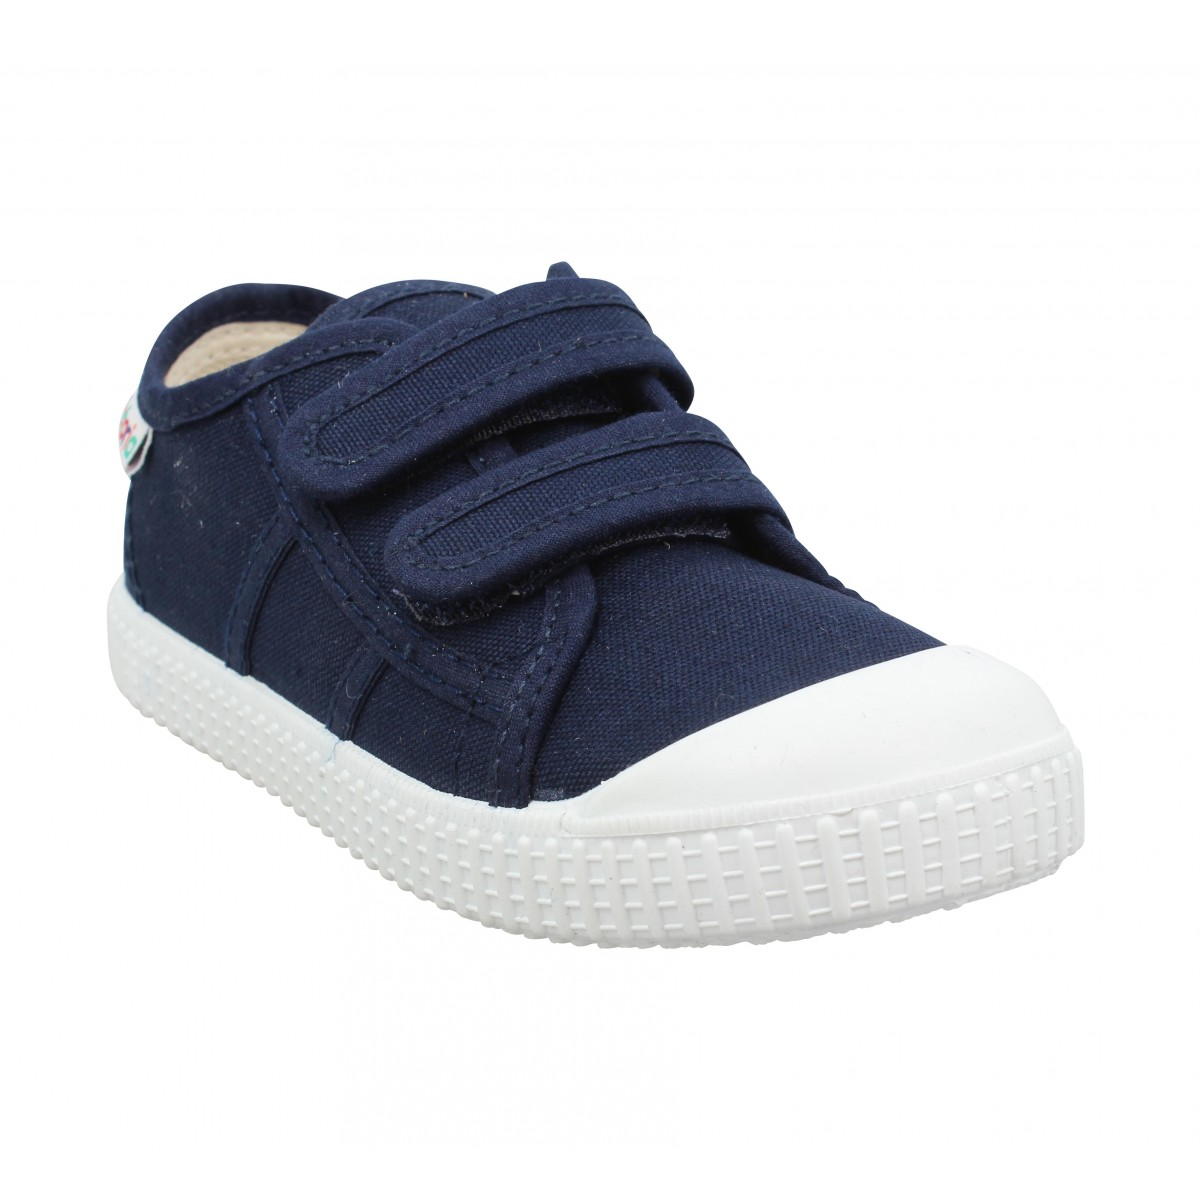 Baskets VICTORIA 36606 Velcro toile Enfant Marine